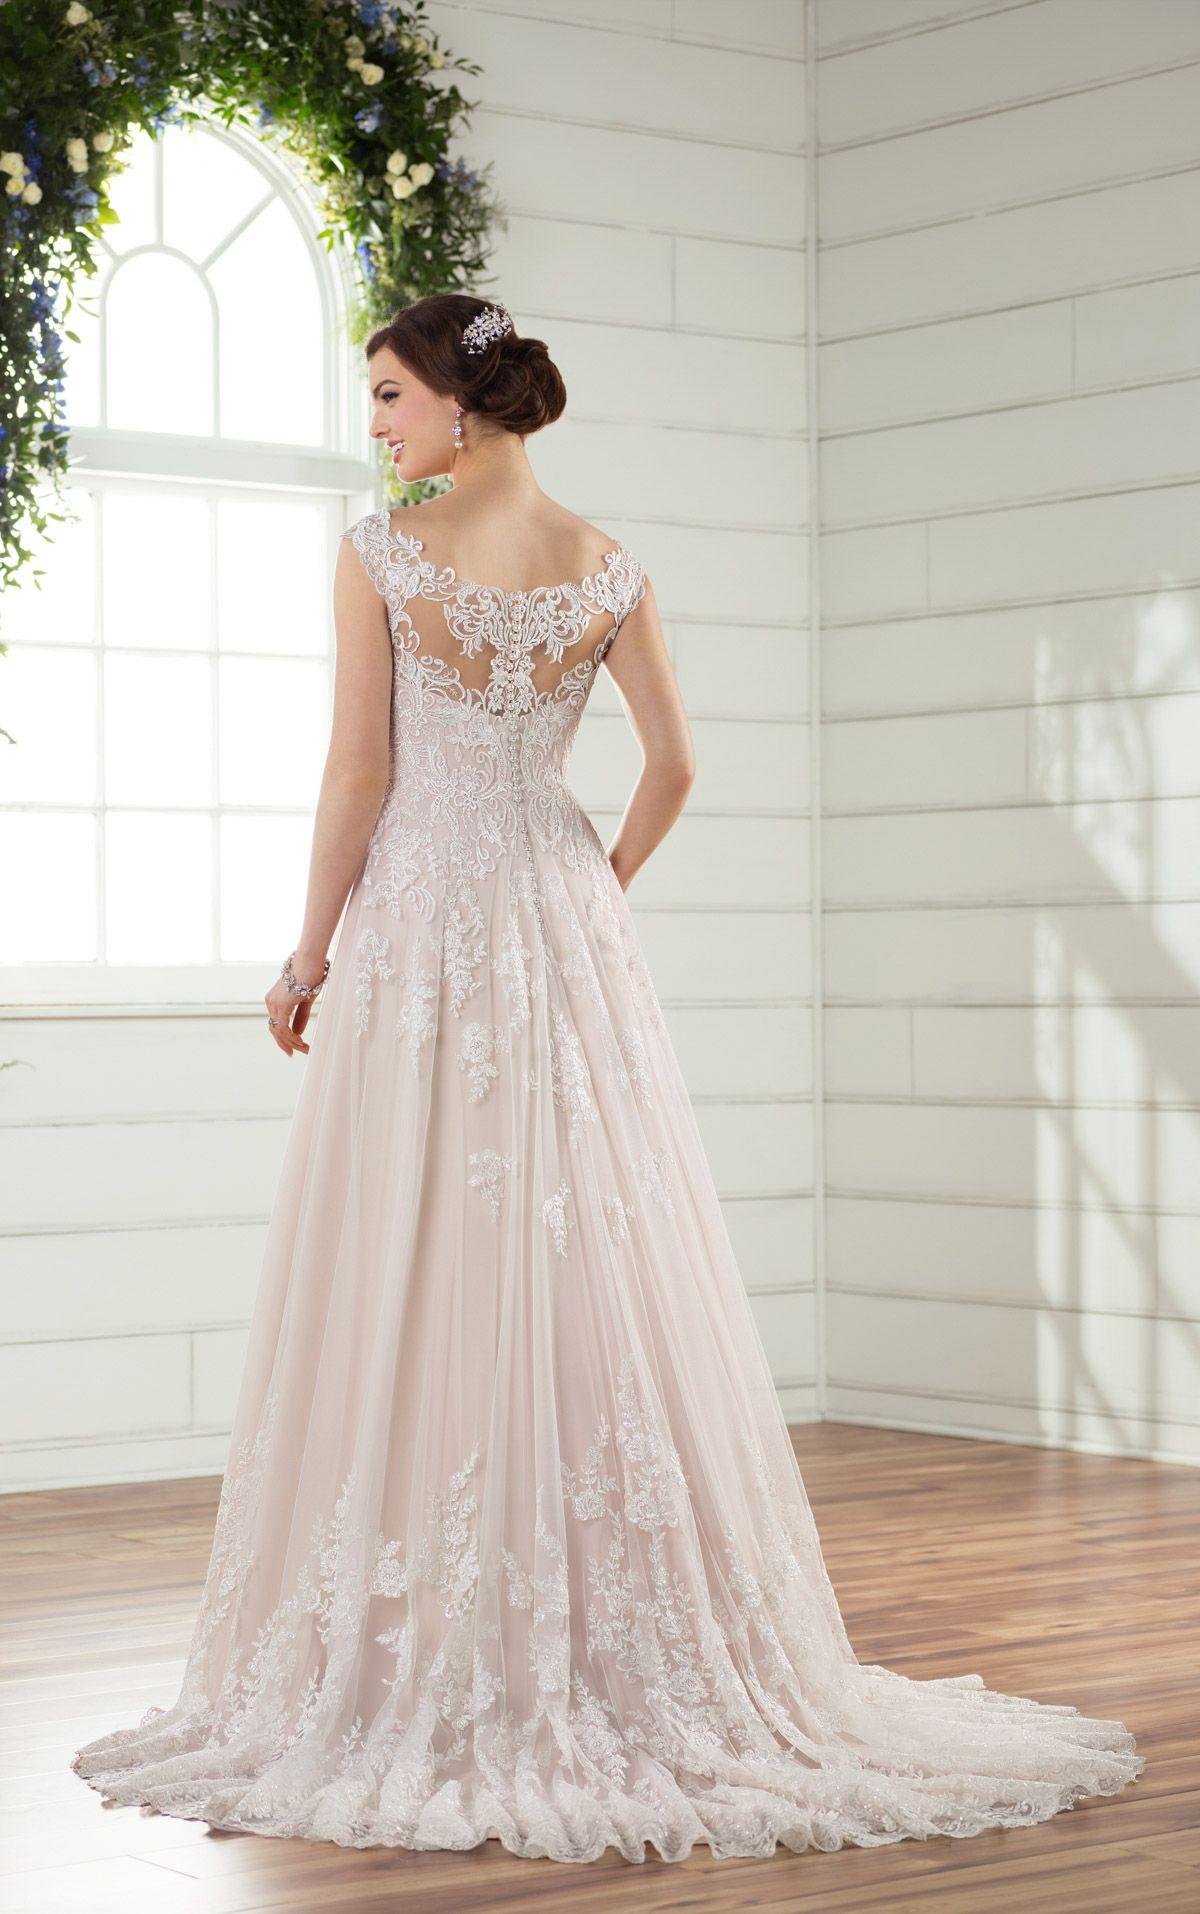 Boho Wedding Dresses in 2020 Wedding dresses, Plus size